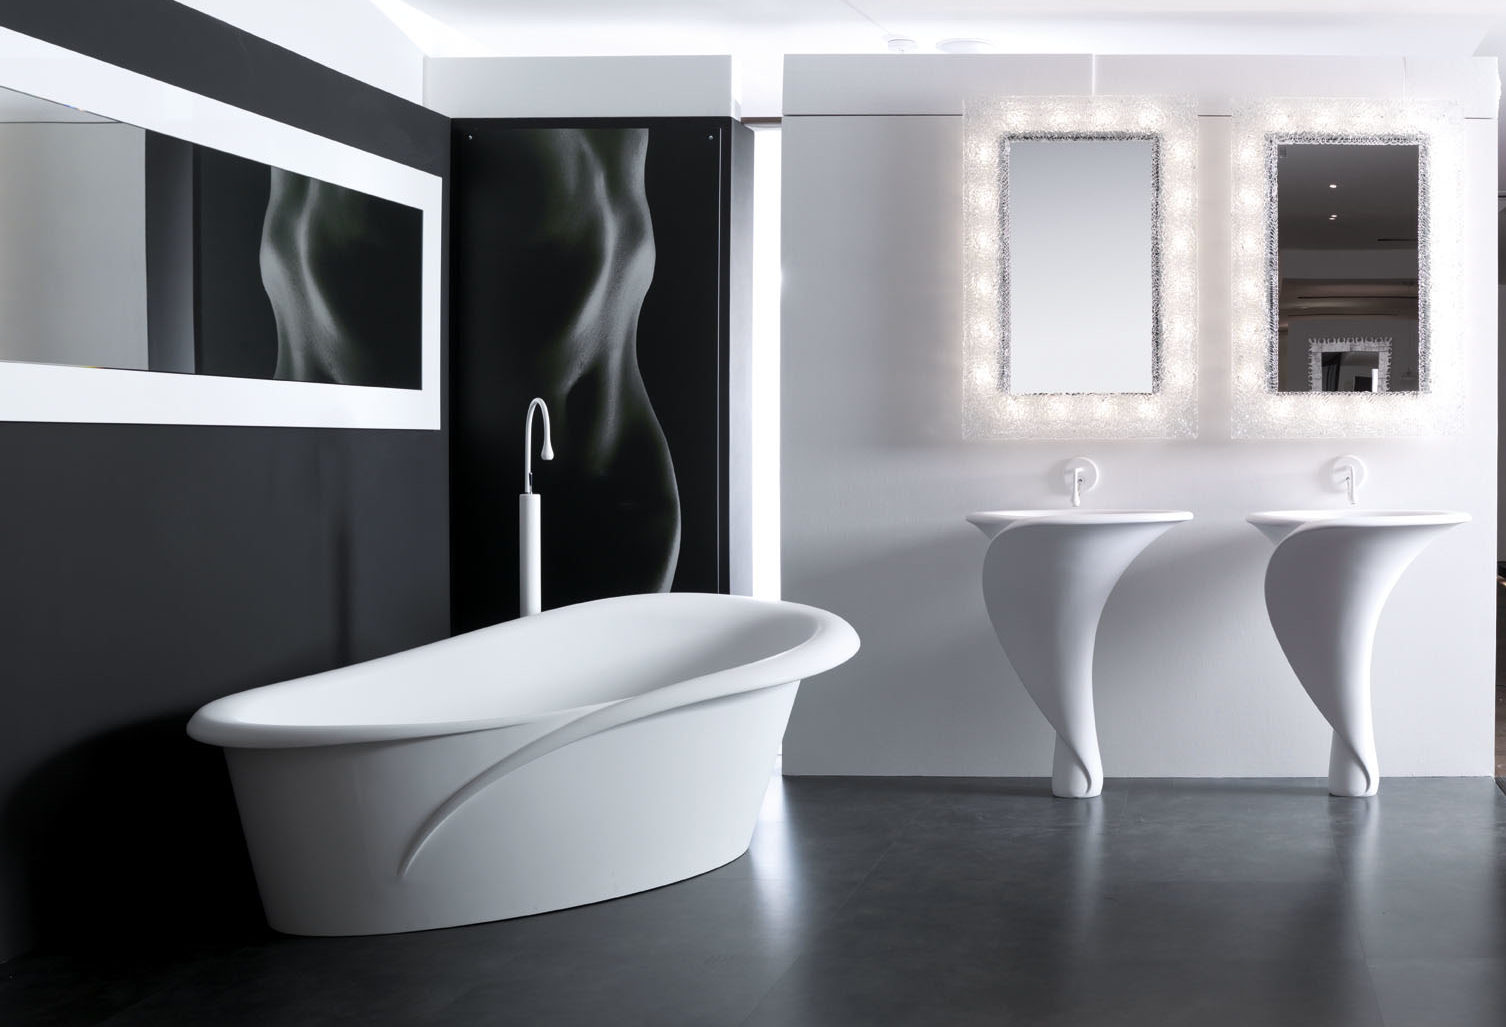 Bathroom furniture,bathroom cabinets - 17991R11 BIS 2 e1608196806960